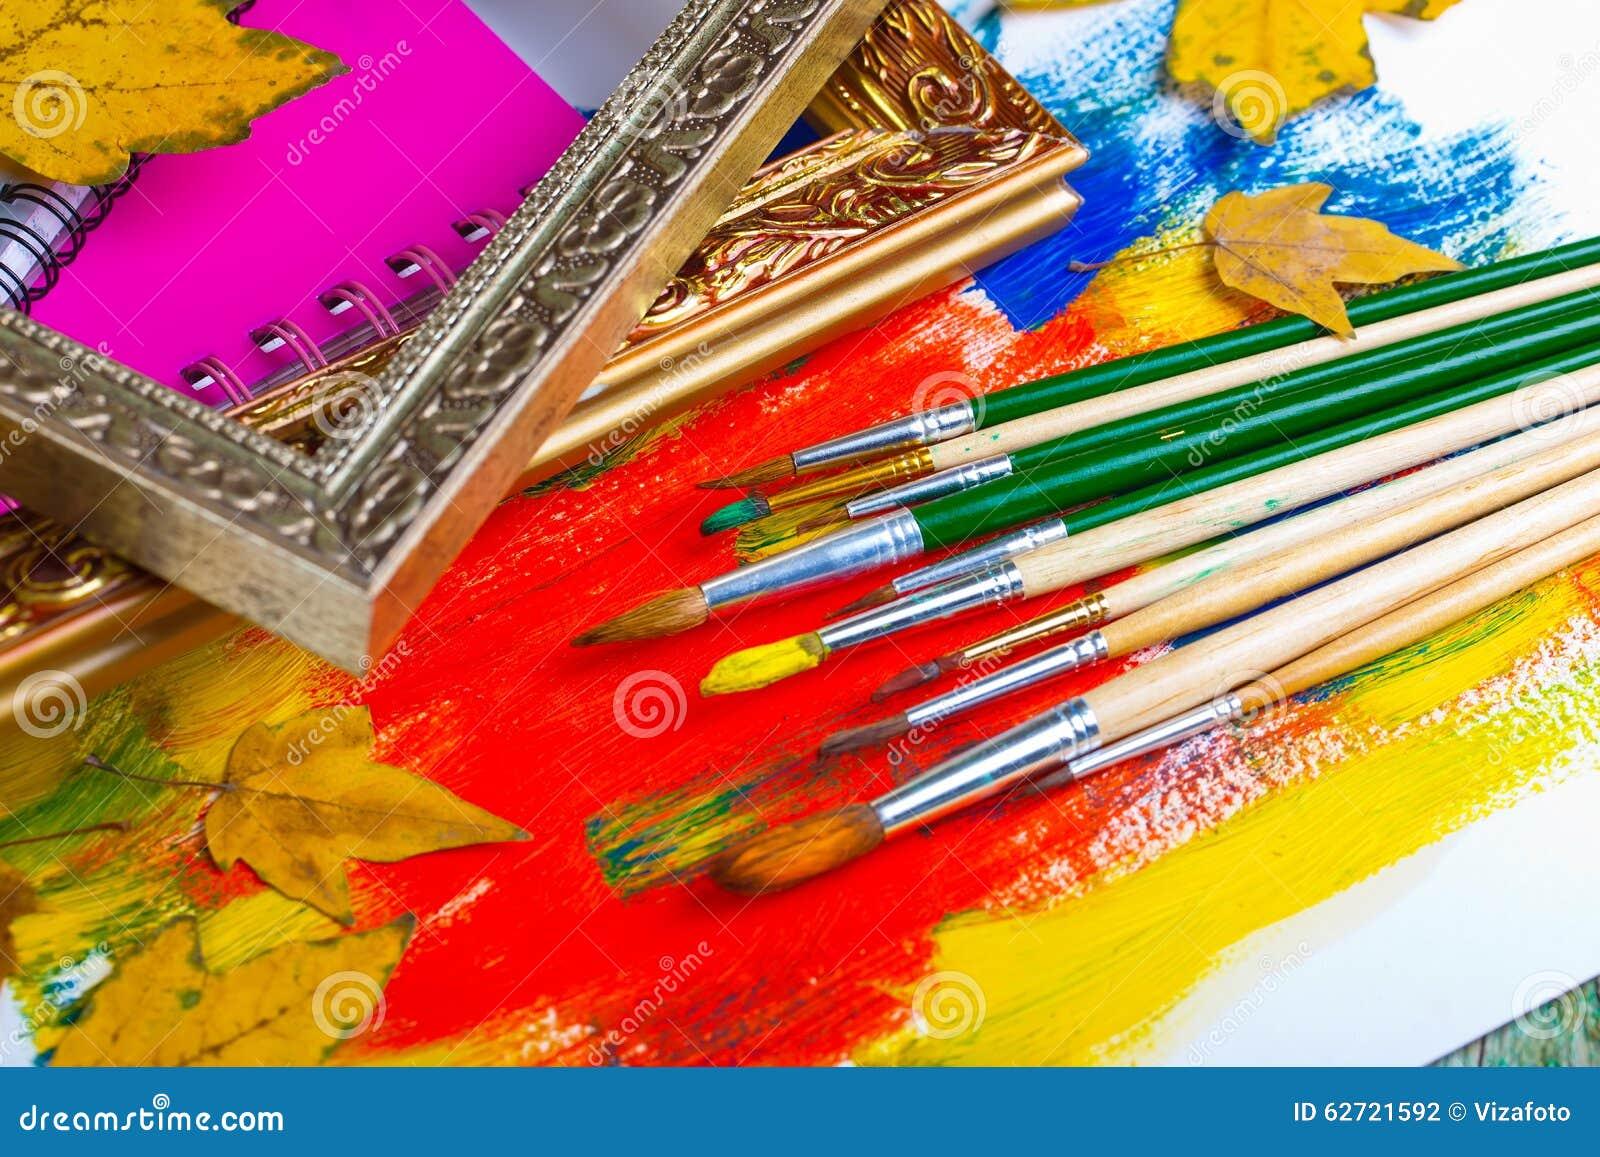 Download Χρώματα και βούρτσες στοκ εικόνες. εικόνα από σύνθεση - 62721592